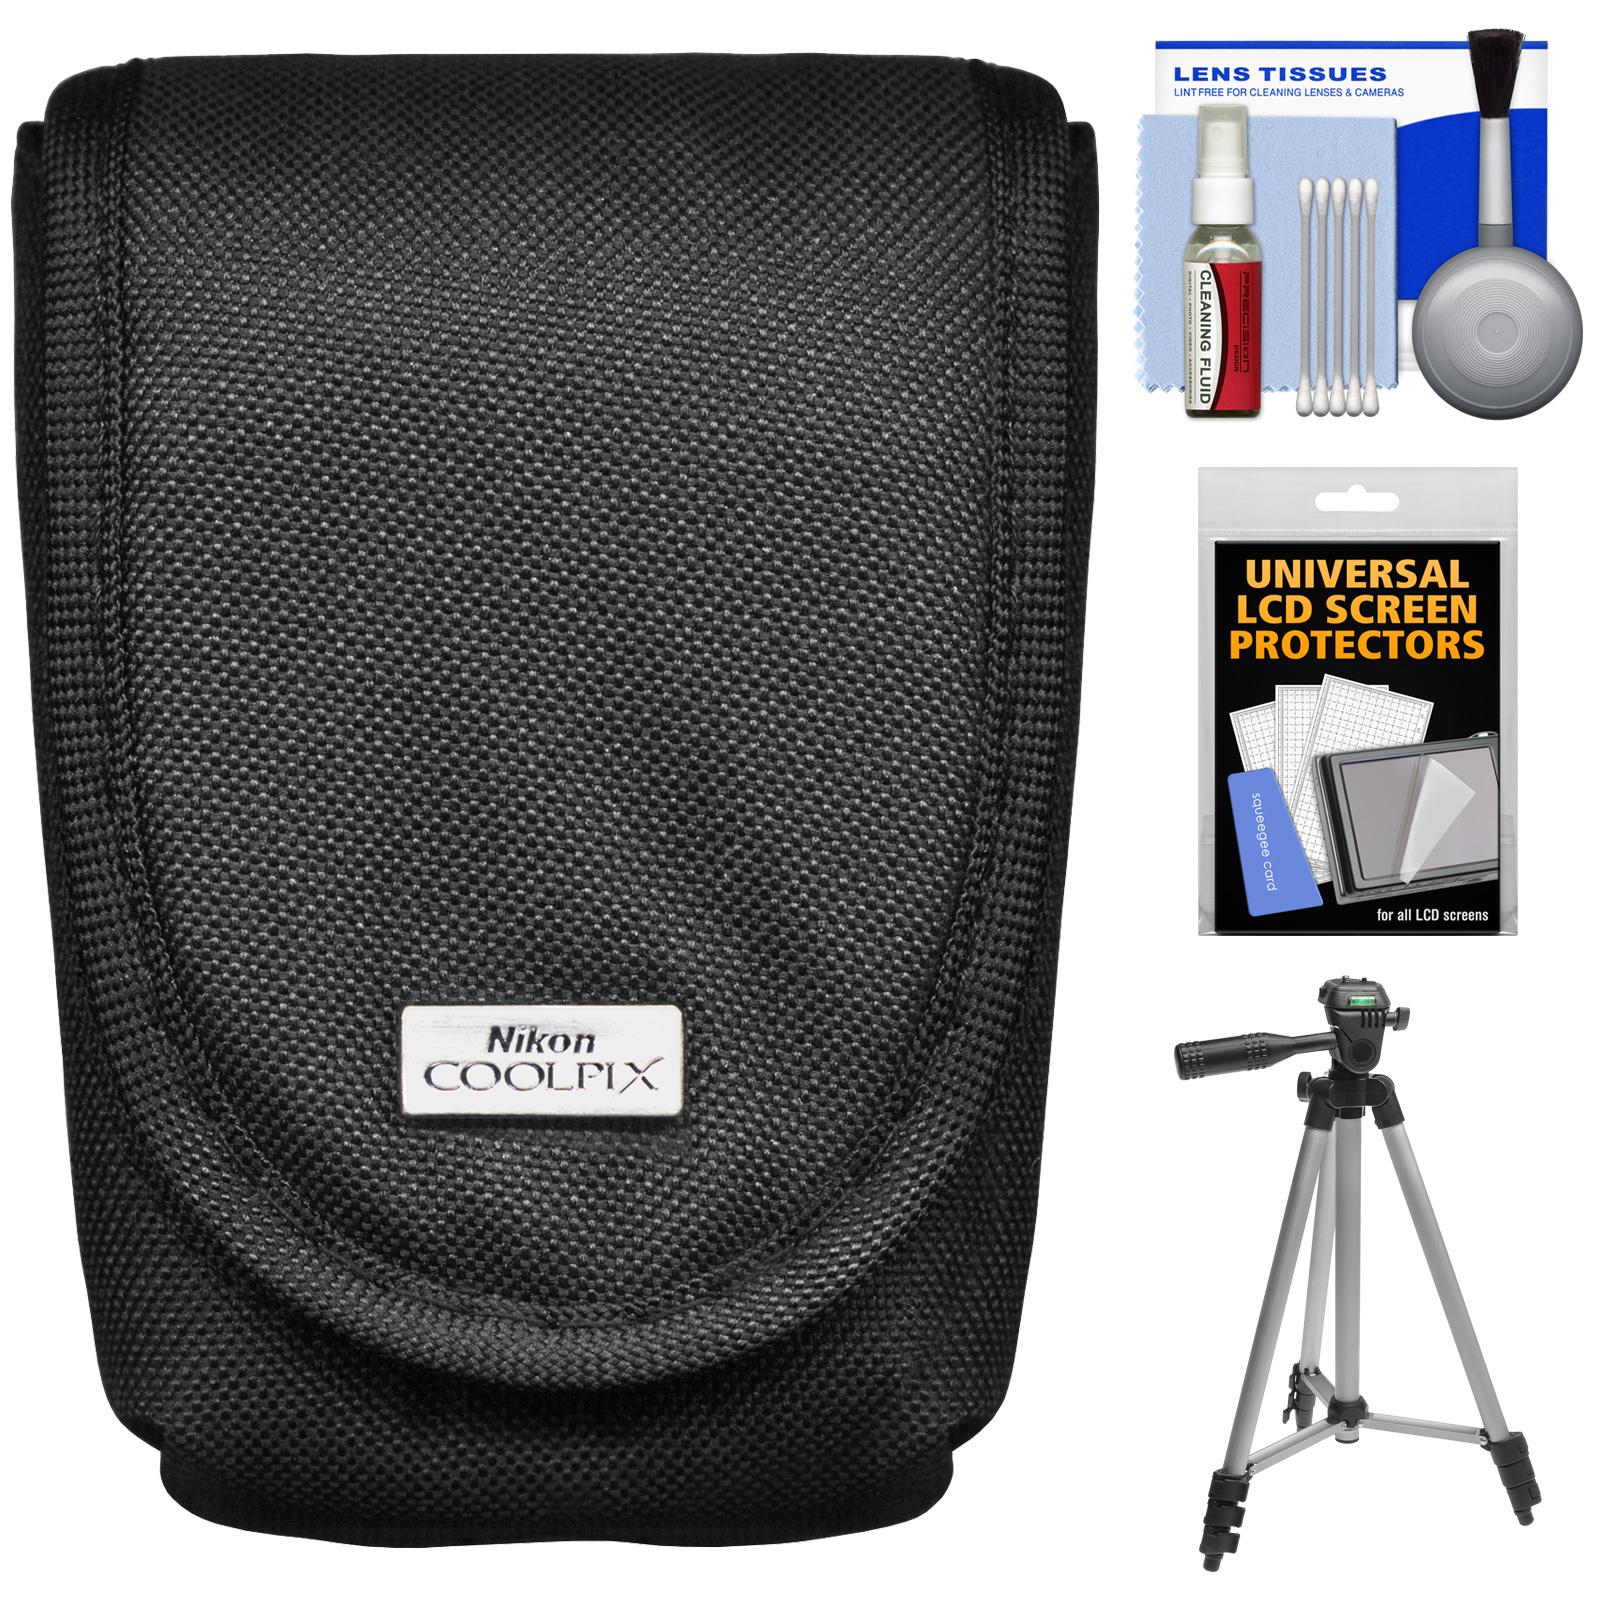 Nikon Coolpix 5879 Digital Camera Case with Tripod + Accessory Kit for AW110, AW120, P340, S01, S02, S32, S3500, S5200, S5300, S6500, S6800, S810C, S9500, S9700